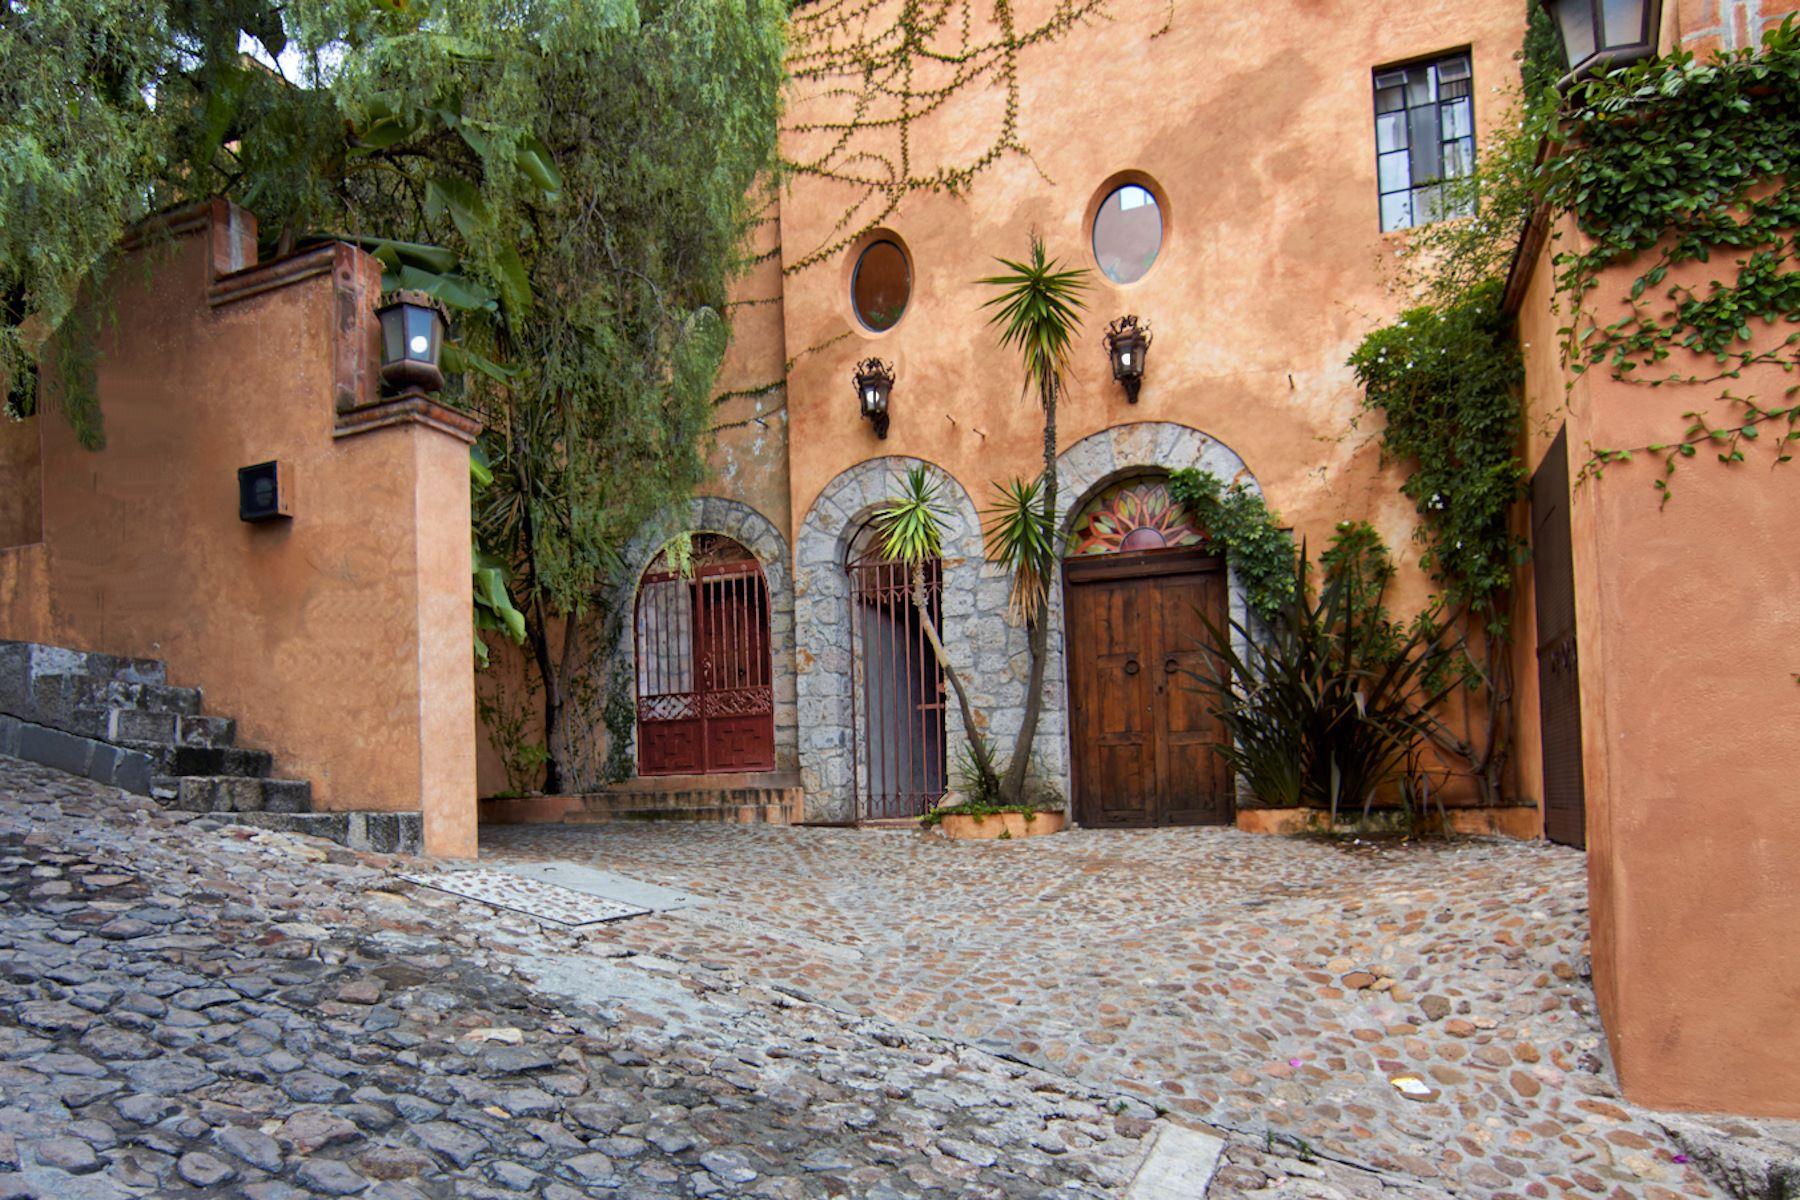 Single Family Home for Sale at Casa Panorama Ojo de Agua 19 San Miguel De Allende, Guanajuato 37777 Mexico